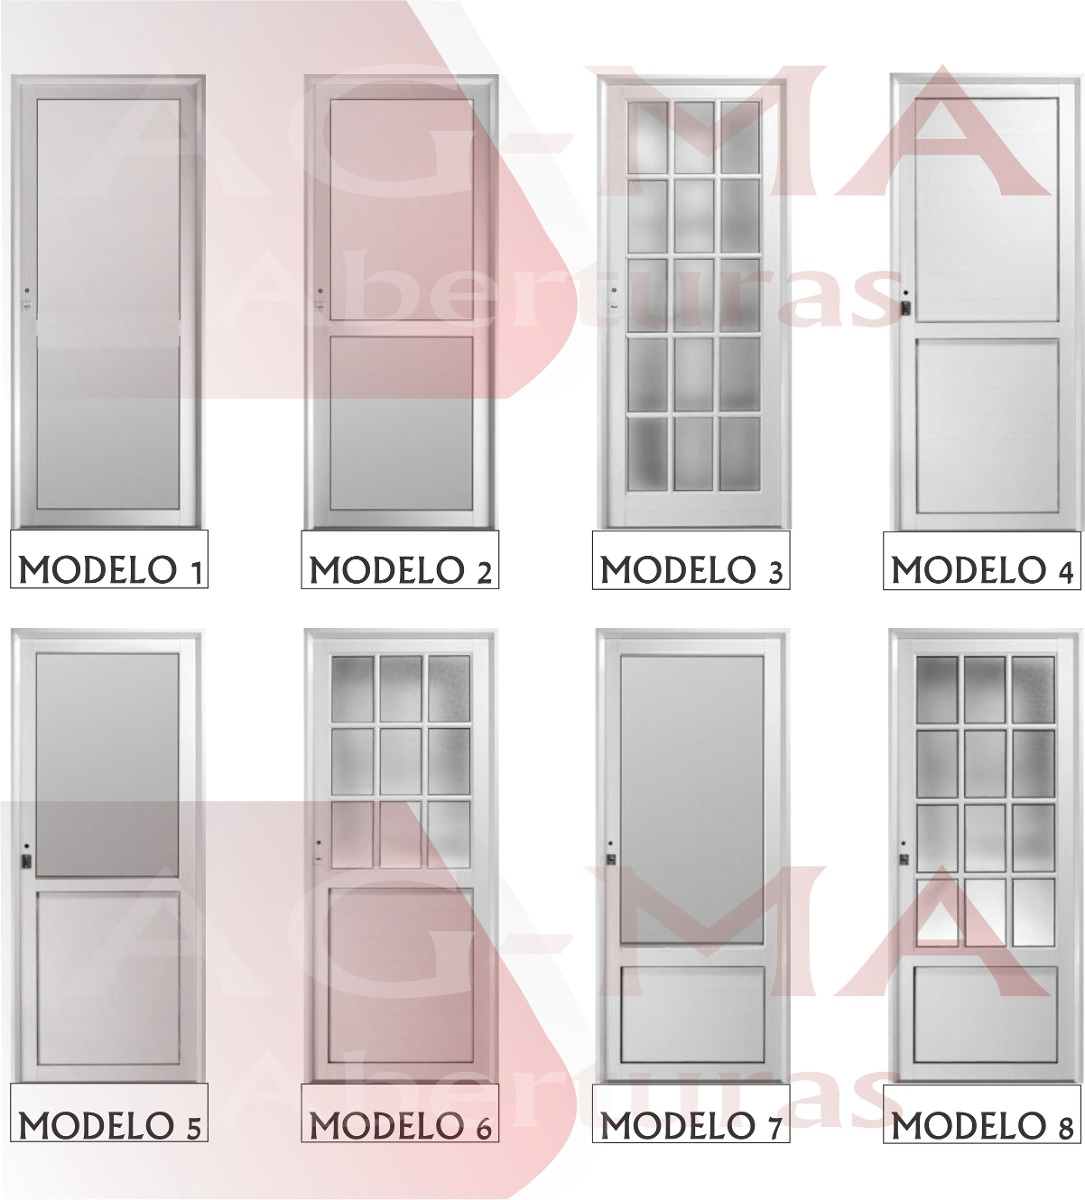 Modelos De Puertas De Aluminio Para Exterior Latest Puerta De